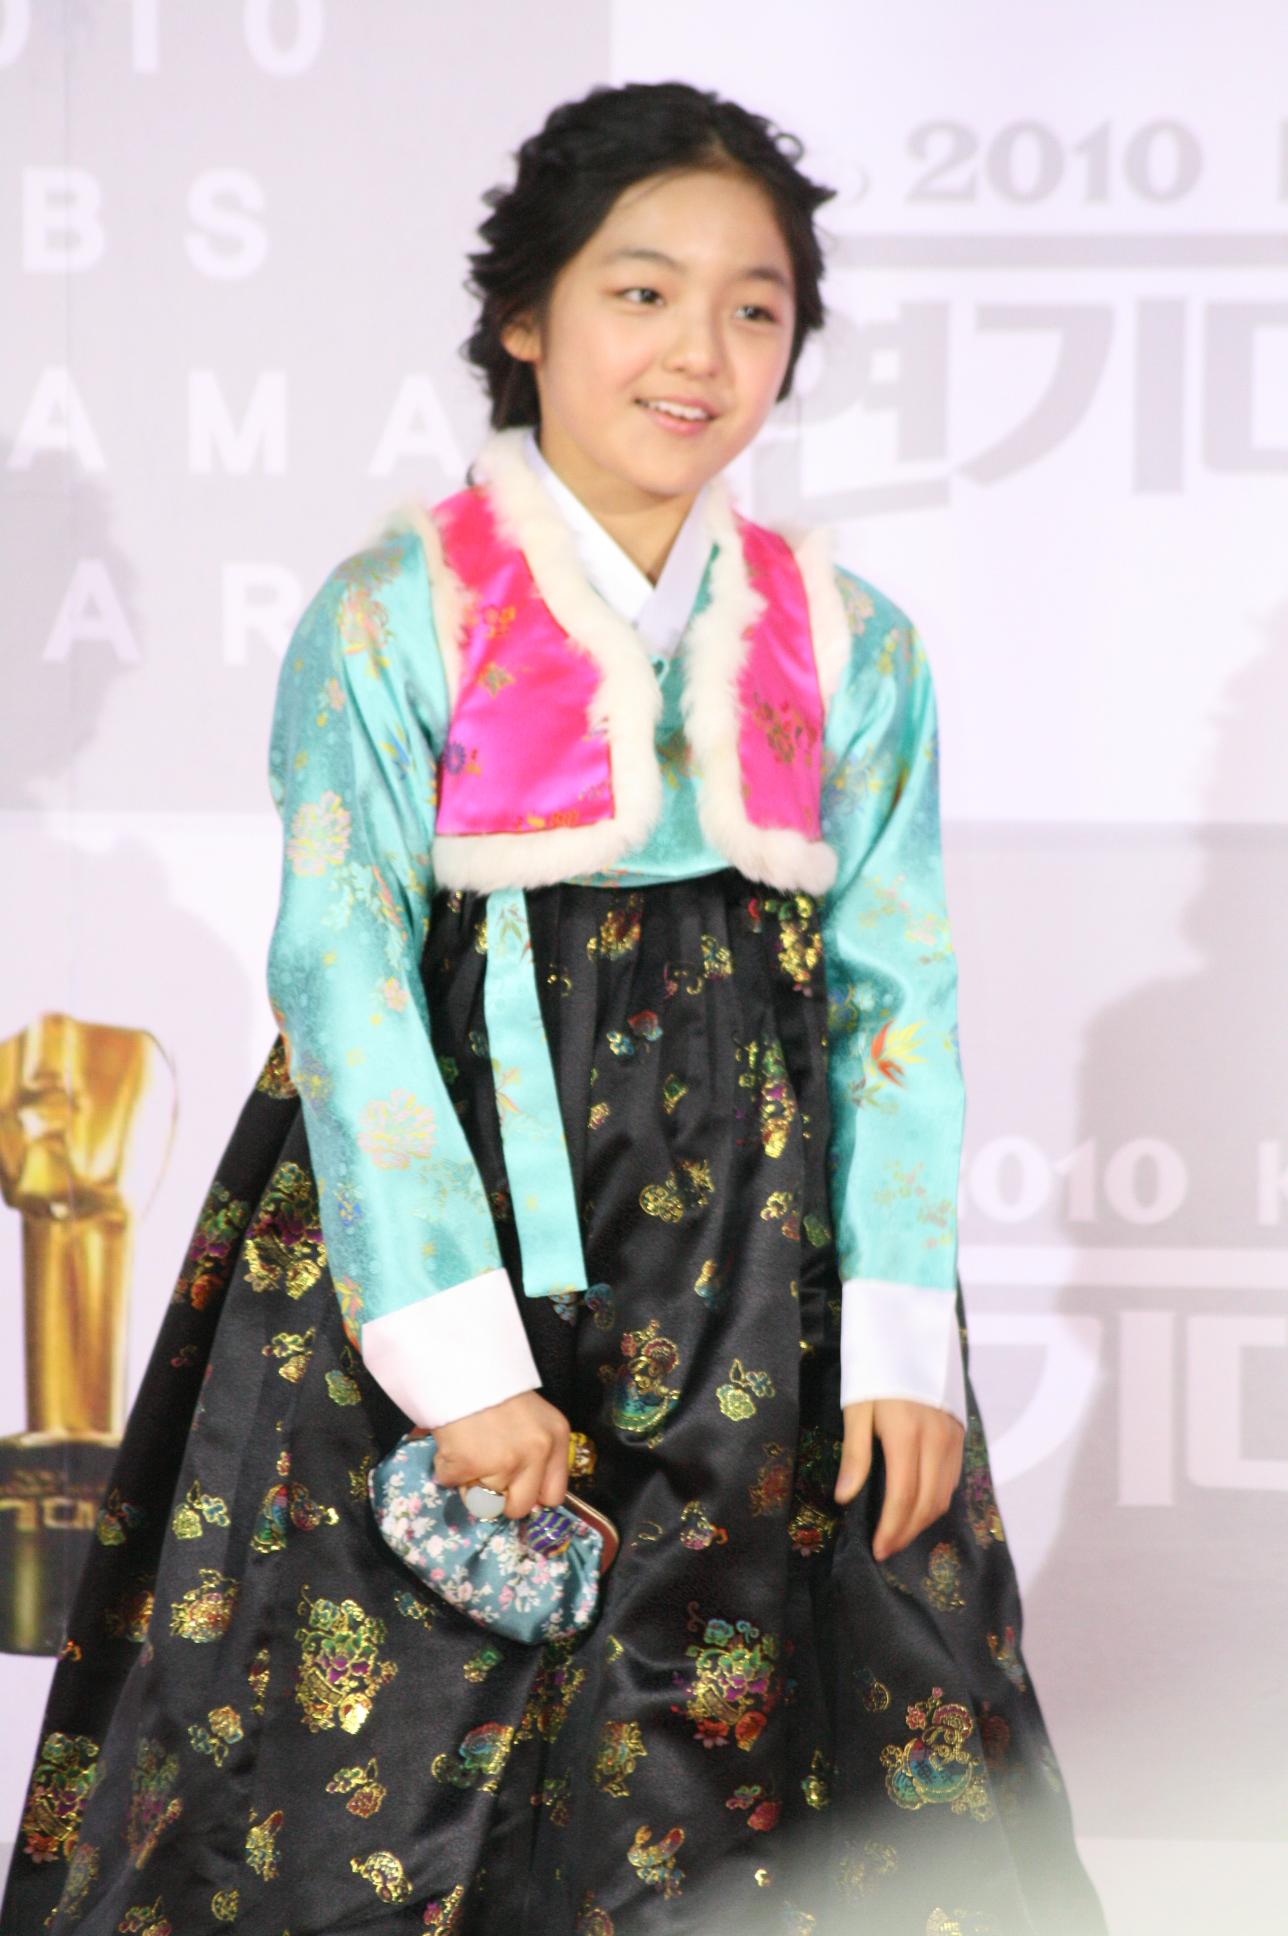 Seo Shin-ae Seo Shinae Wikipedia ting Vit